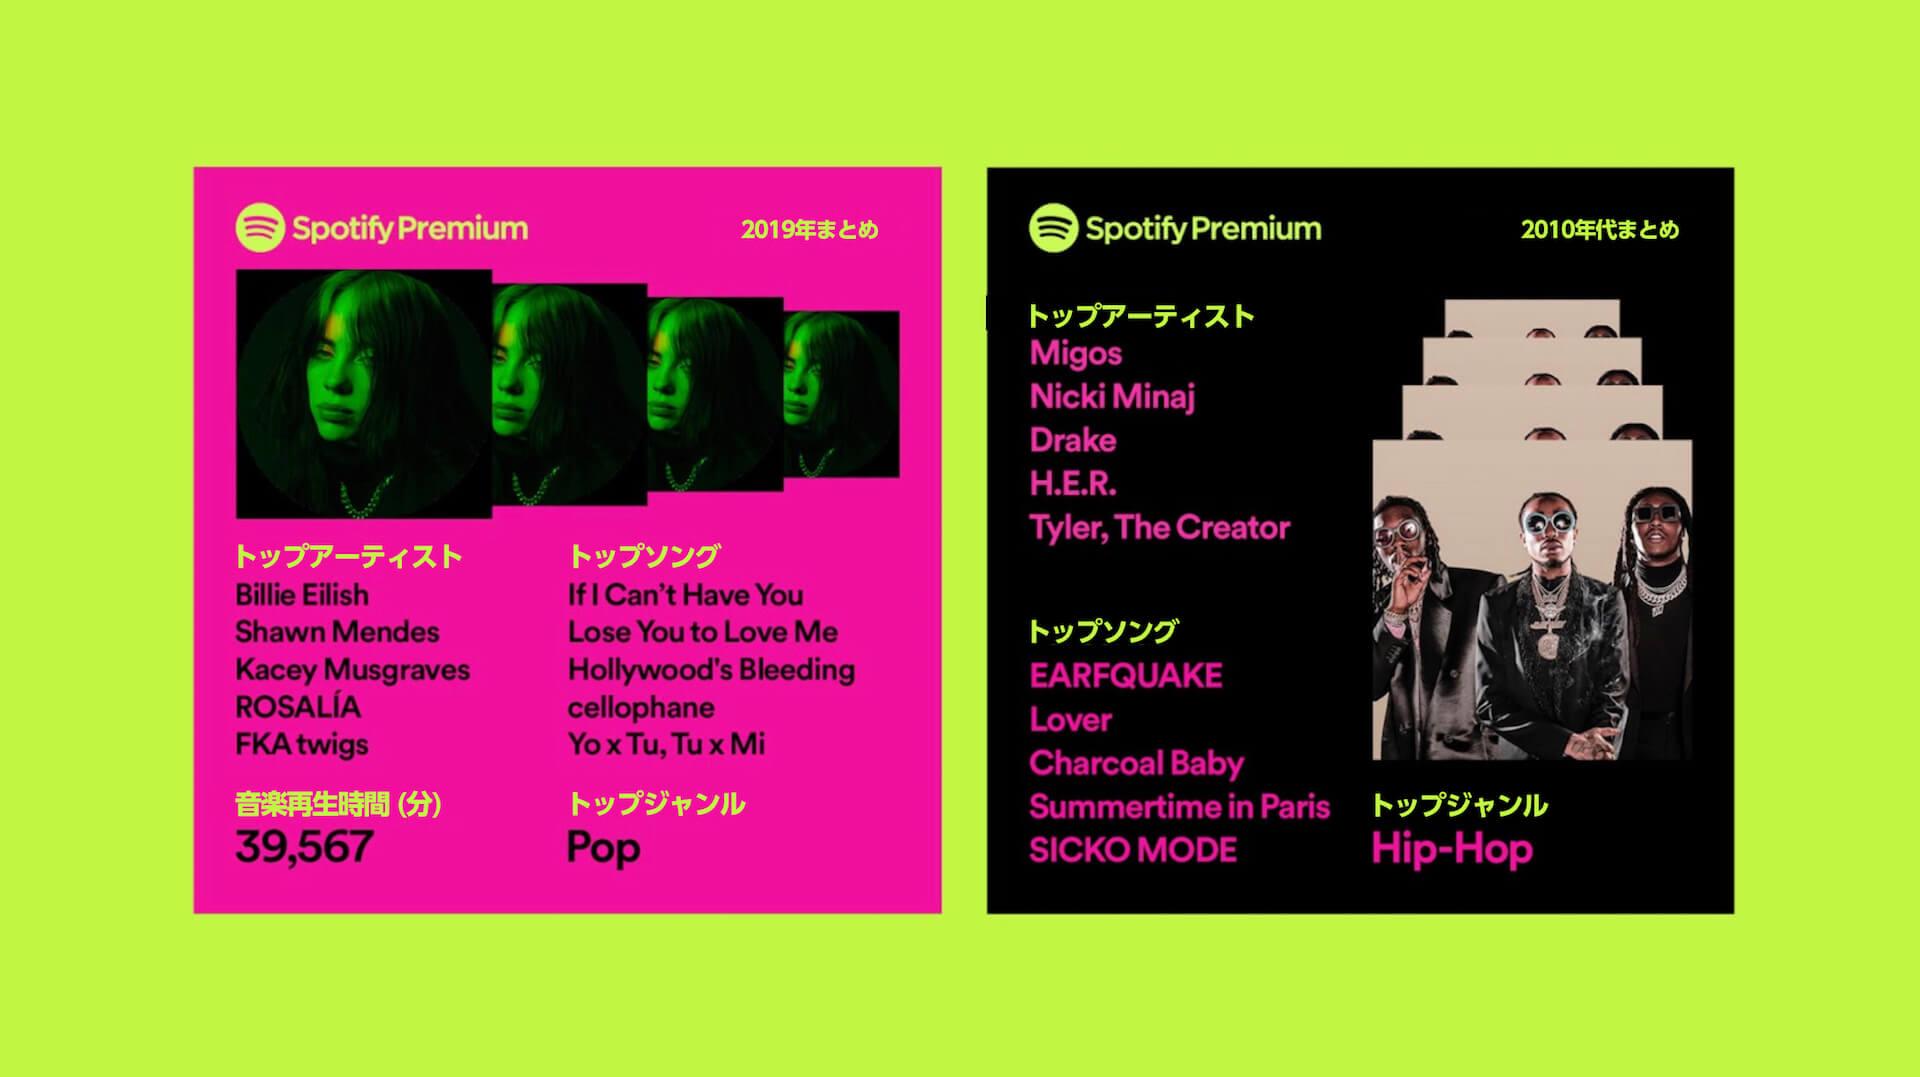 Spotifyであなたの2019年を振り返ろう!「あなたの2019年まとめ」が本日より提供開始 music191205_spotify_1